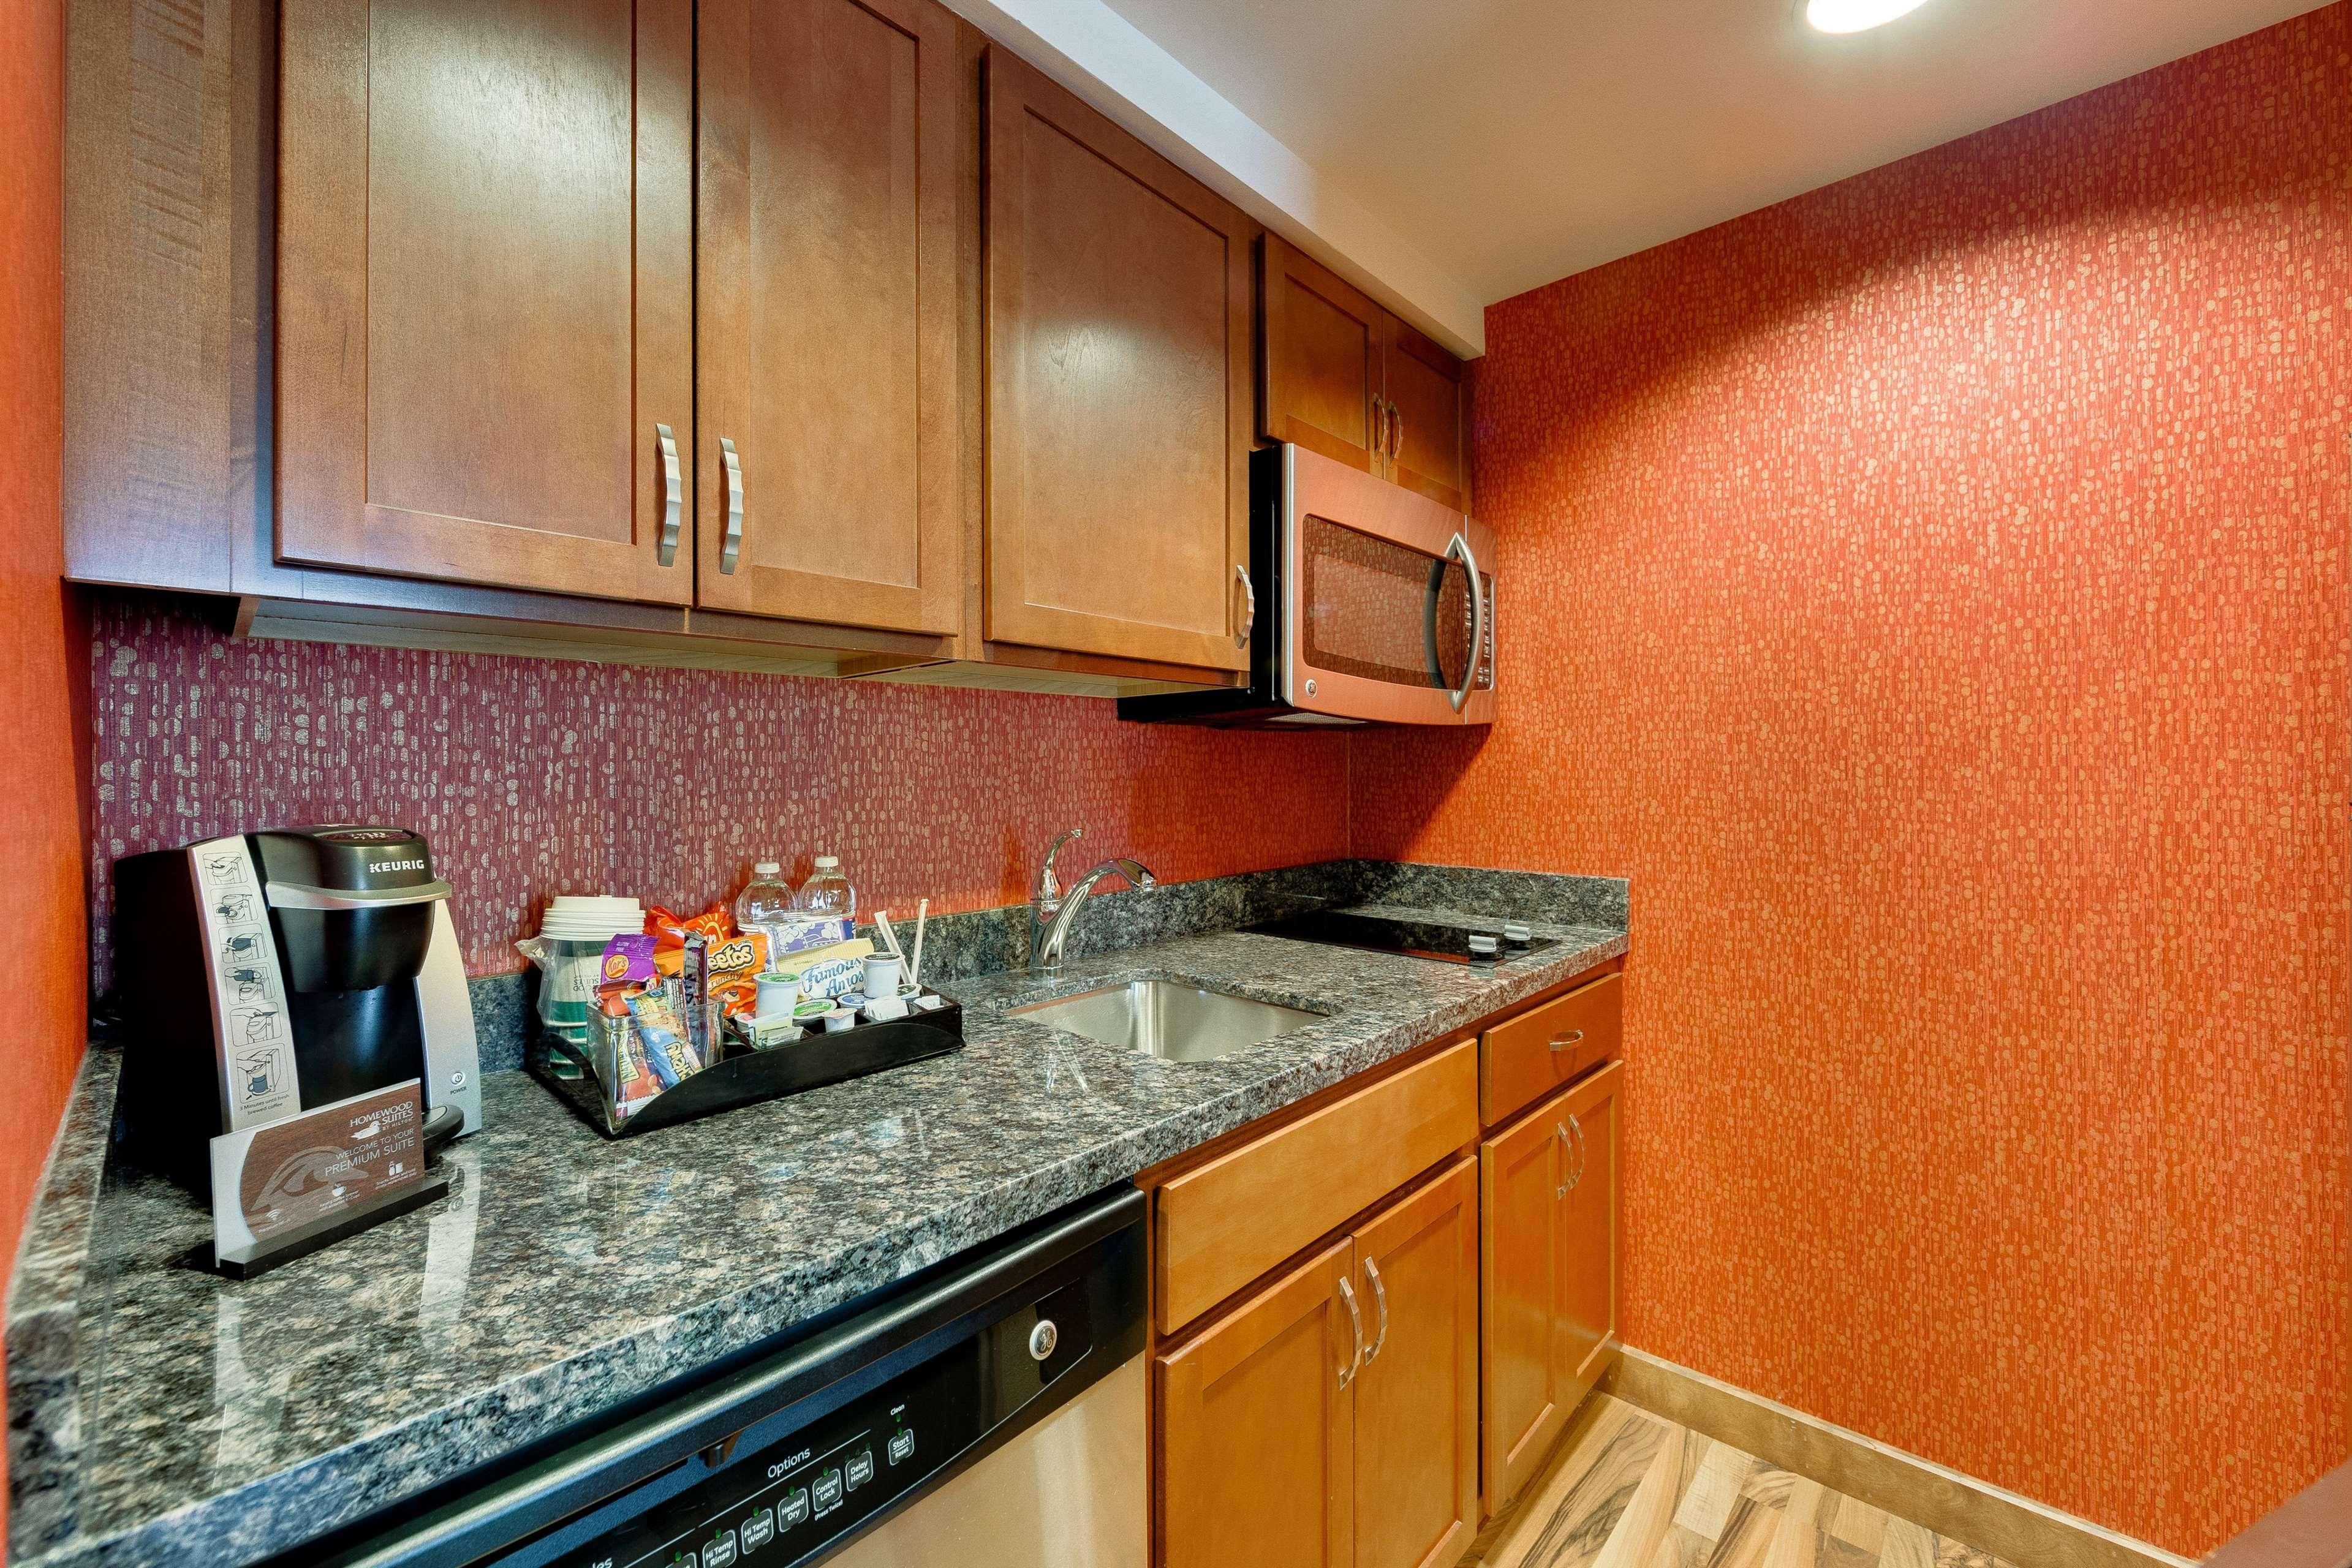 Homewood Suites by Hilton Fort Worth - Medical Center, TX image 20